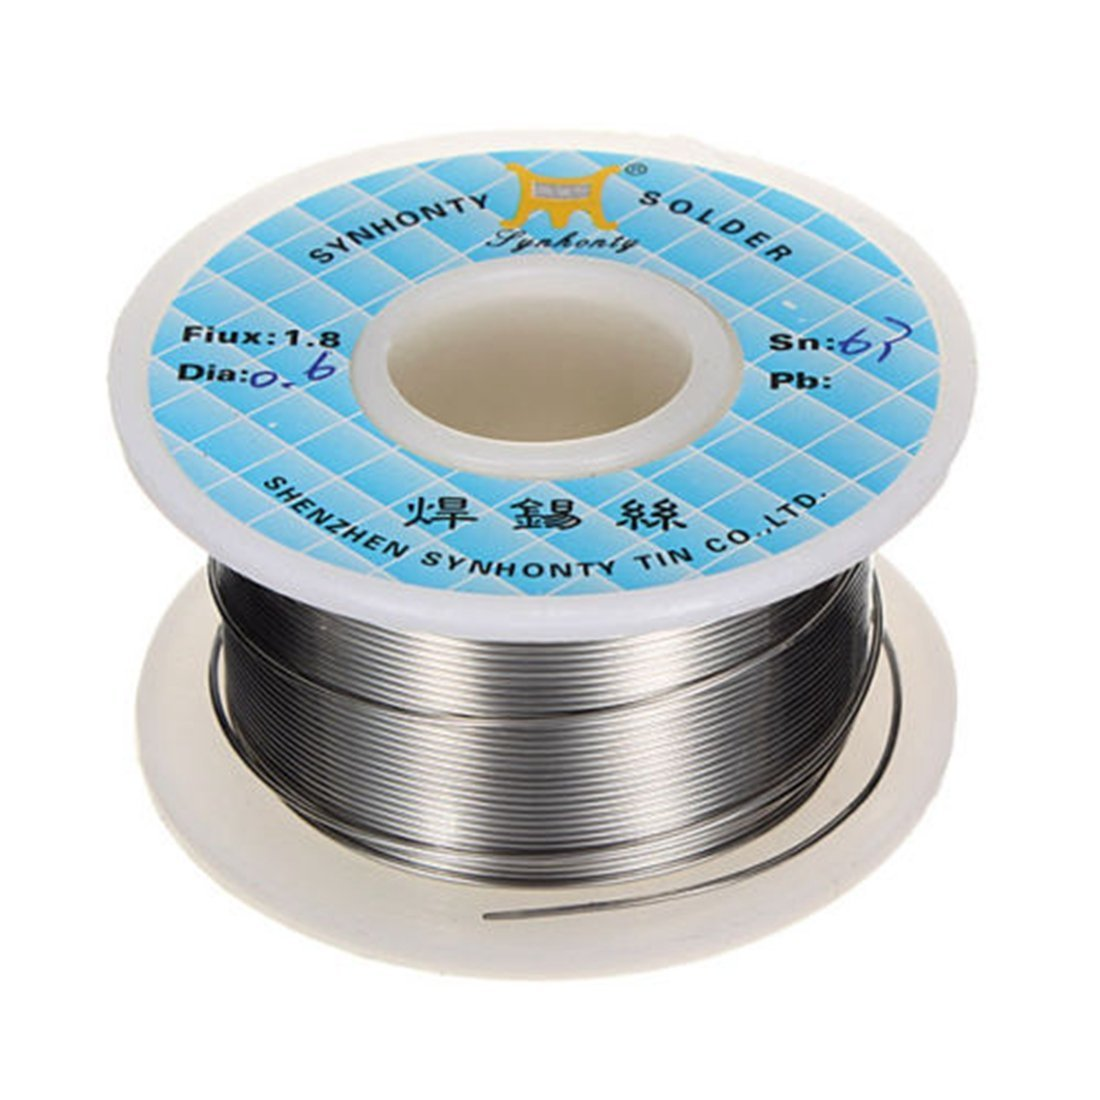 Rosin core solder wire - SYNHONTY 0.6mm 50G 65ft 63/37 Rosin Core ...